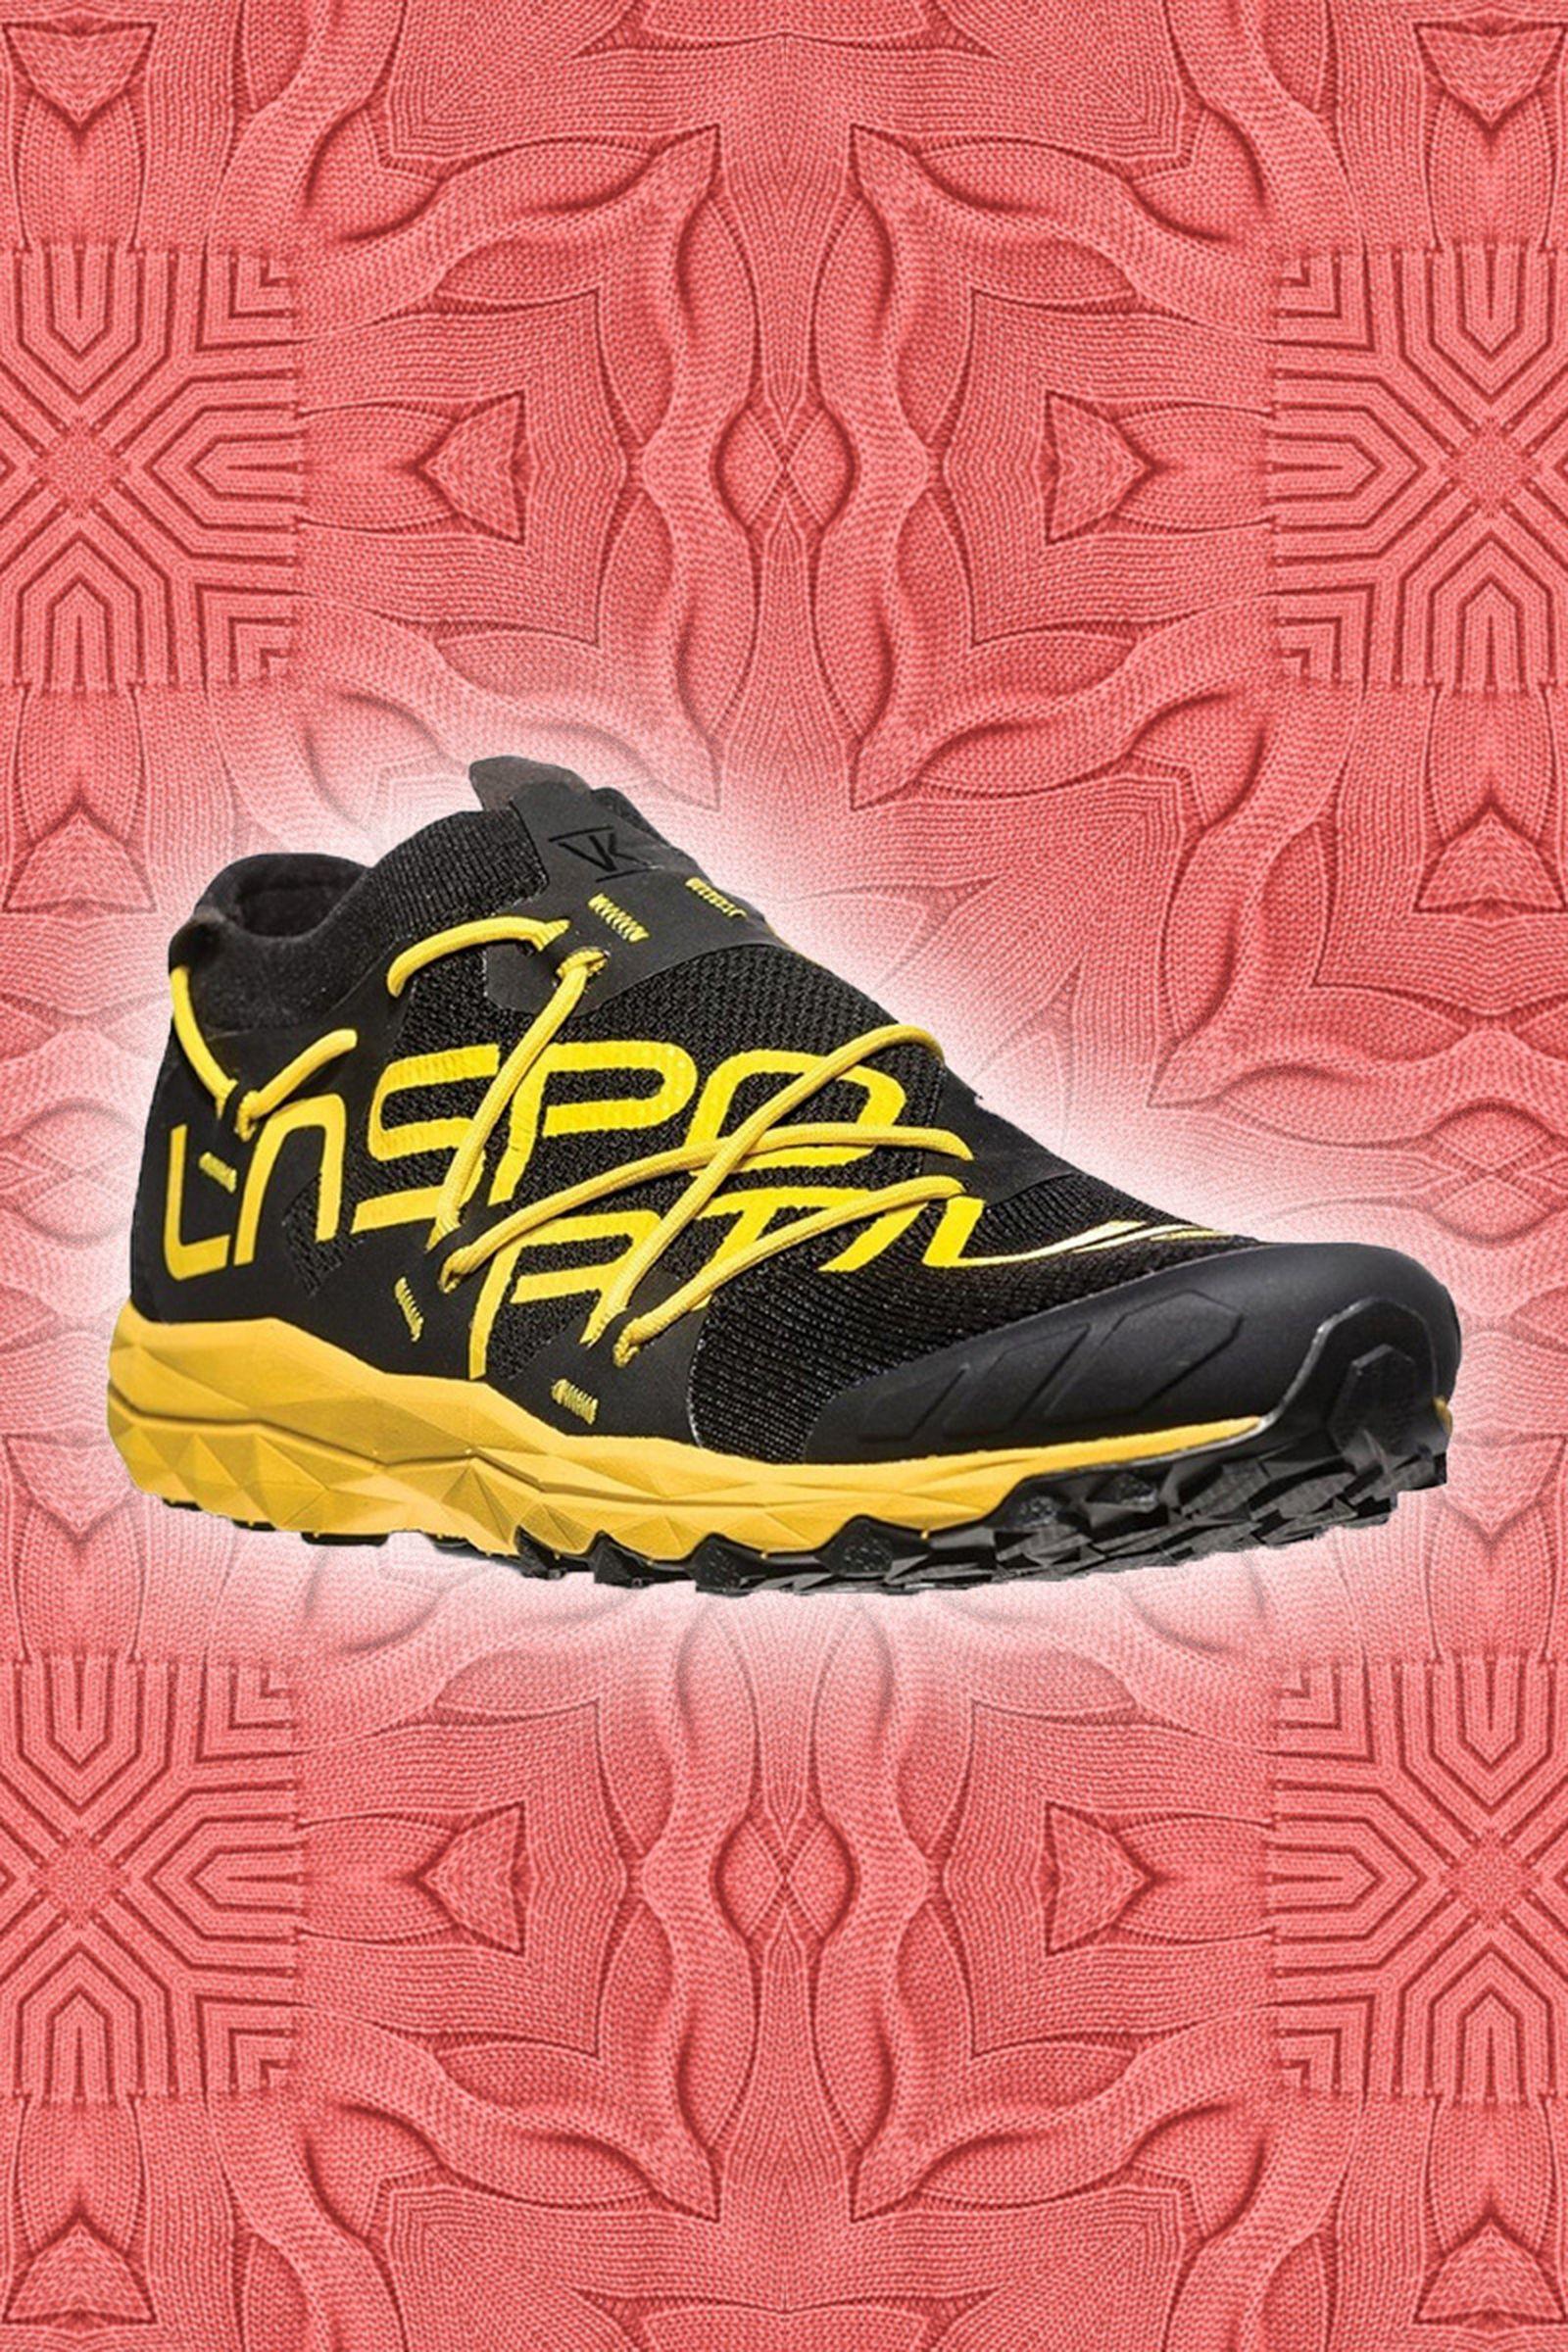 ED Materialist Trail Shoe Valhalla FA Ralph Lauren filson living libations